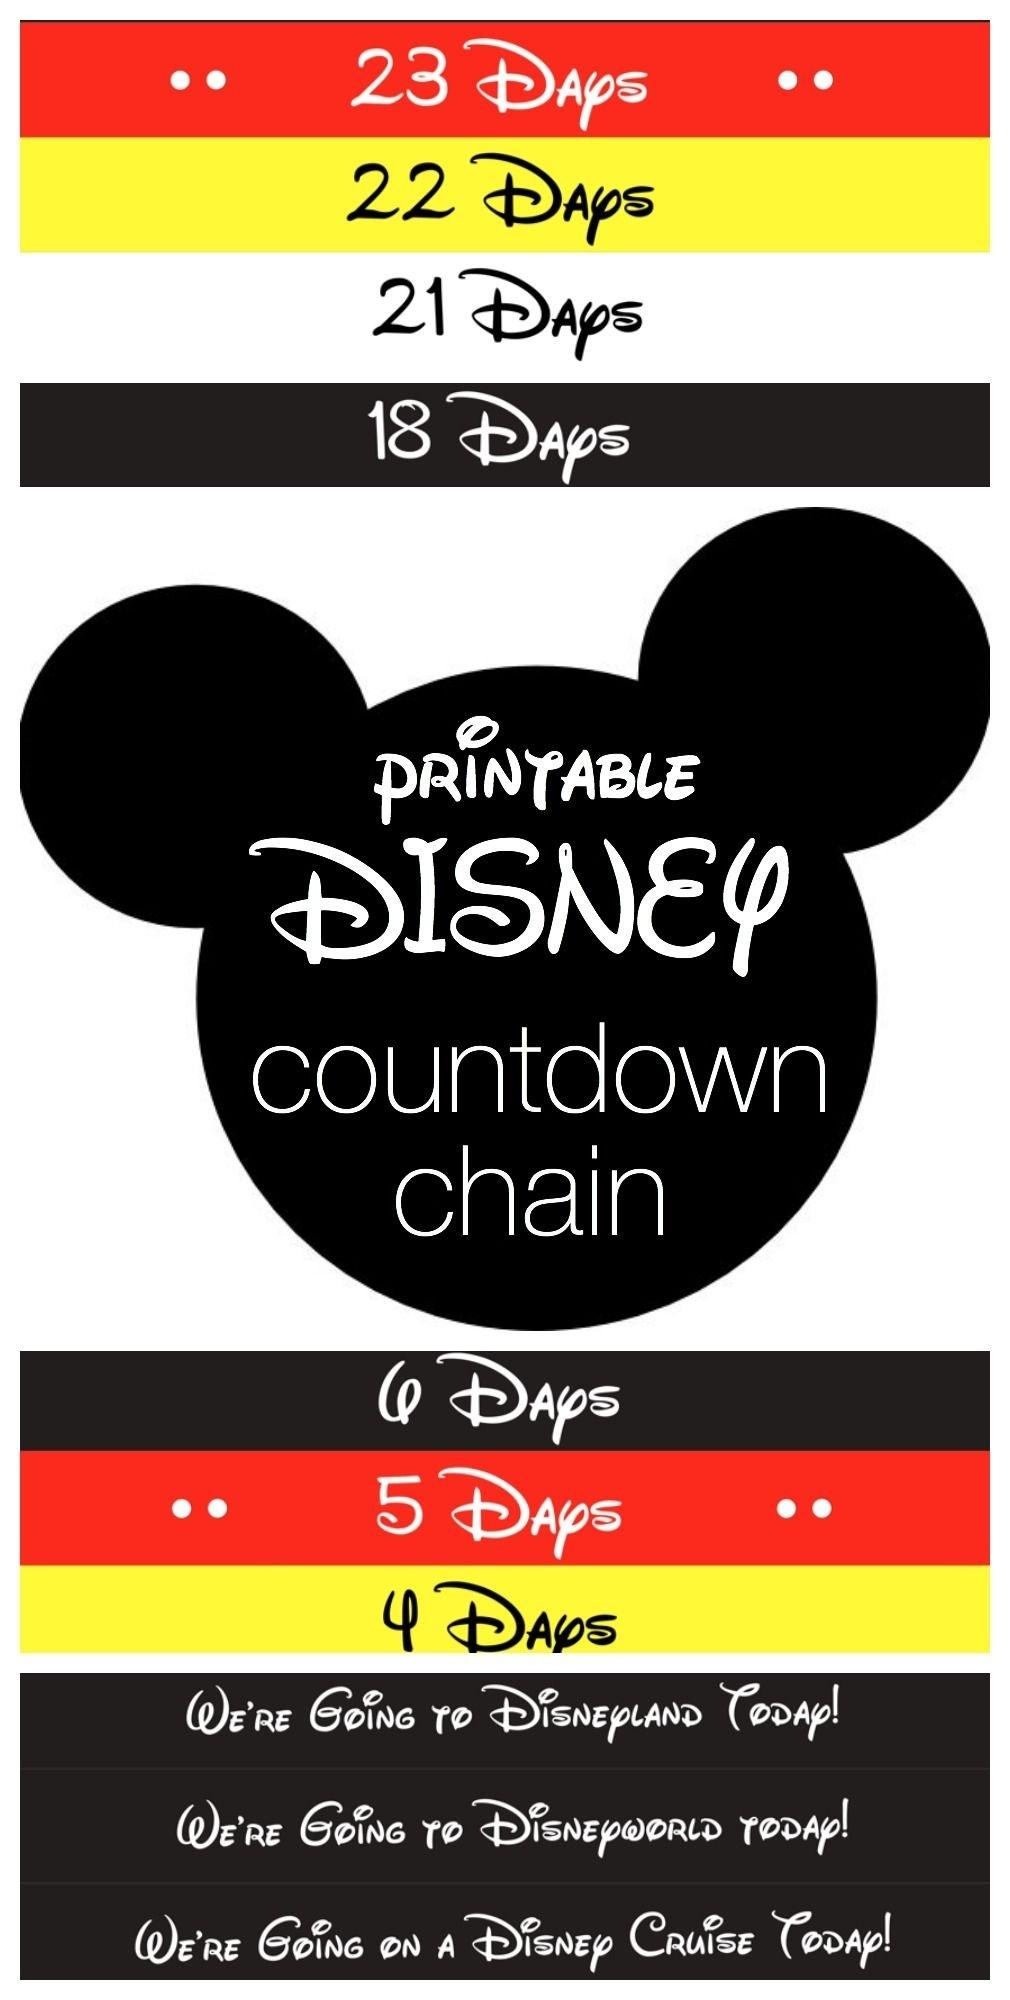 Disney Countdown Chain   Best Of Pinterest   Disney Countdown Disney Countdown Calendar App